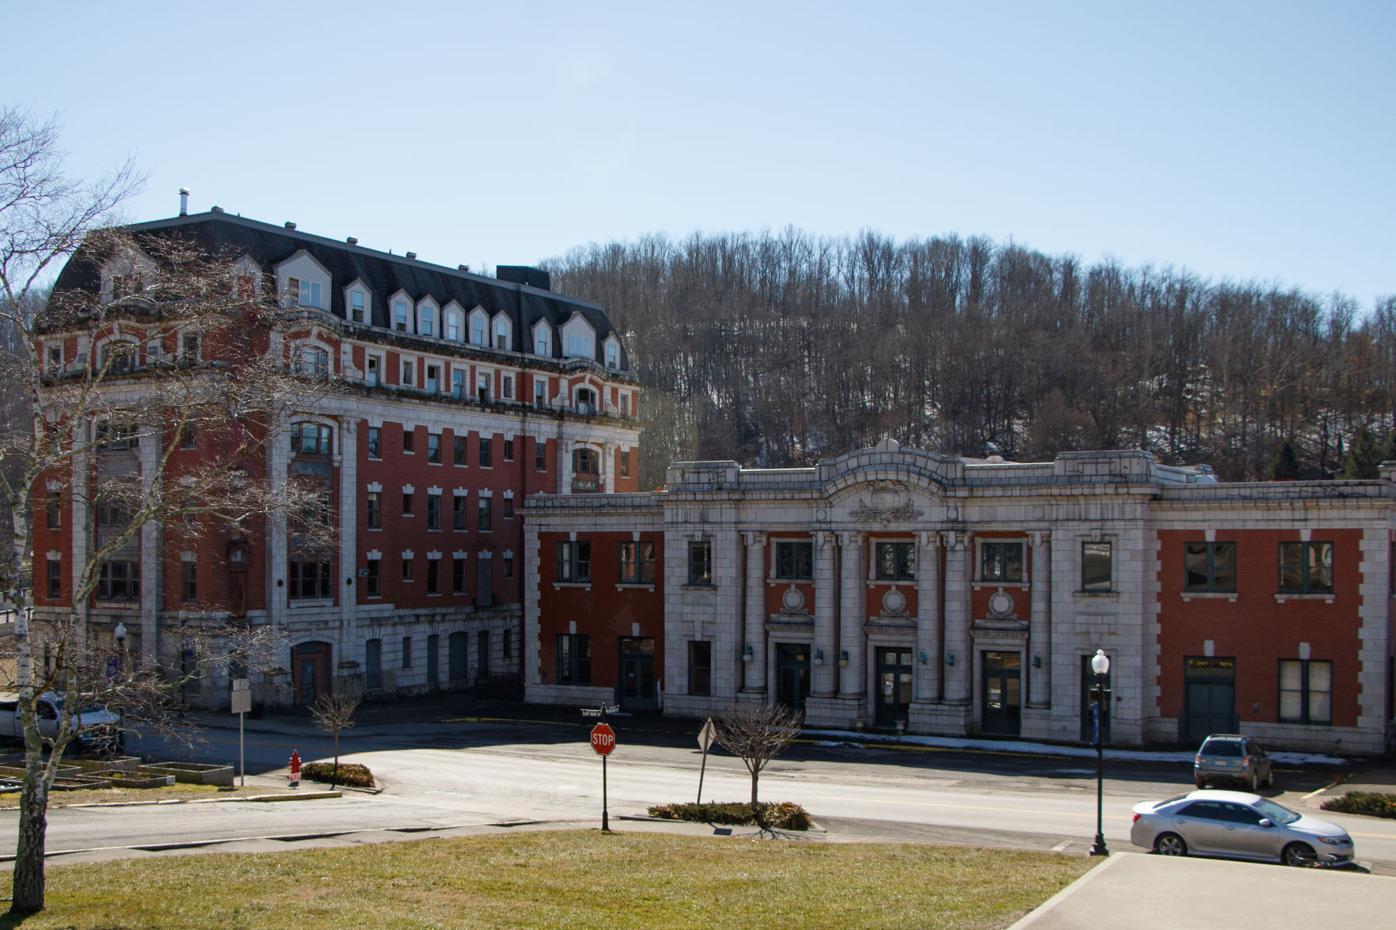 The B&O Passenger Station and Willard Hotel